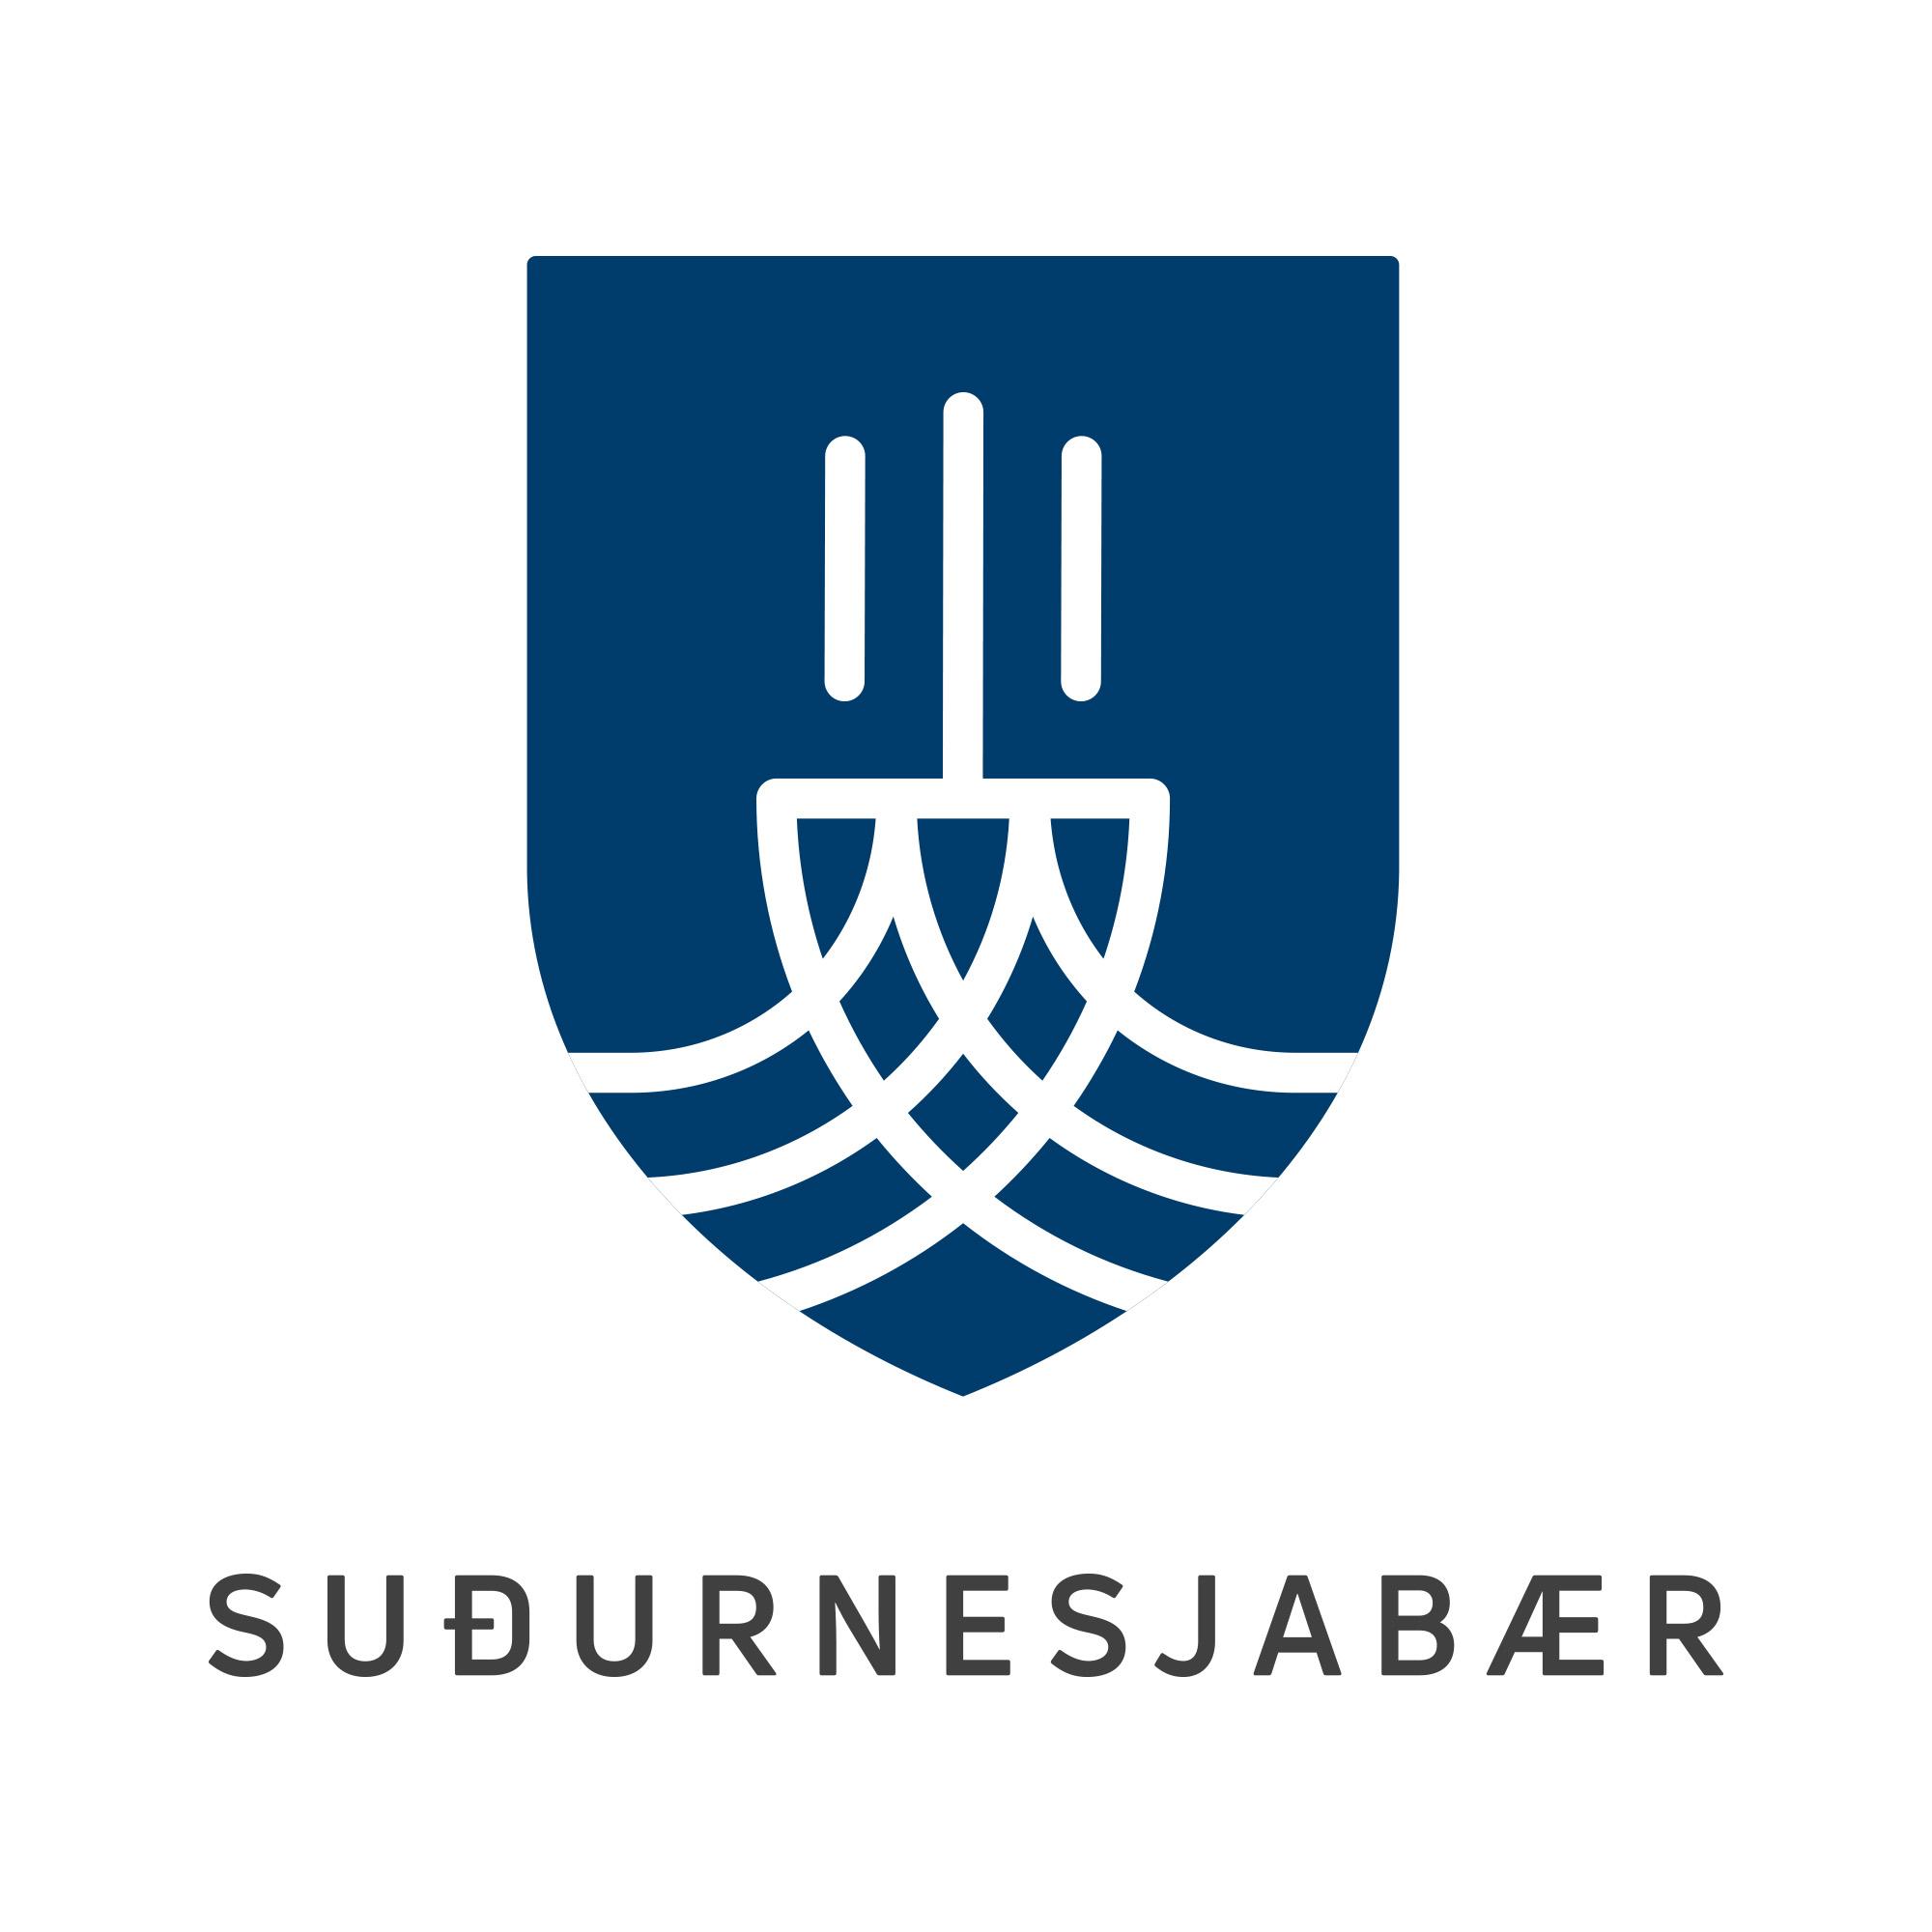 S.B – Skjoldur – Blue logo